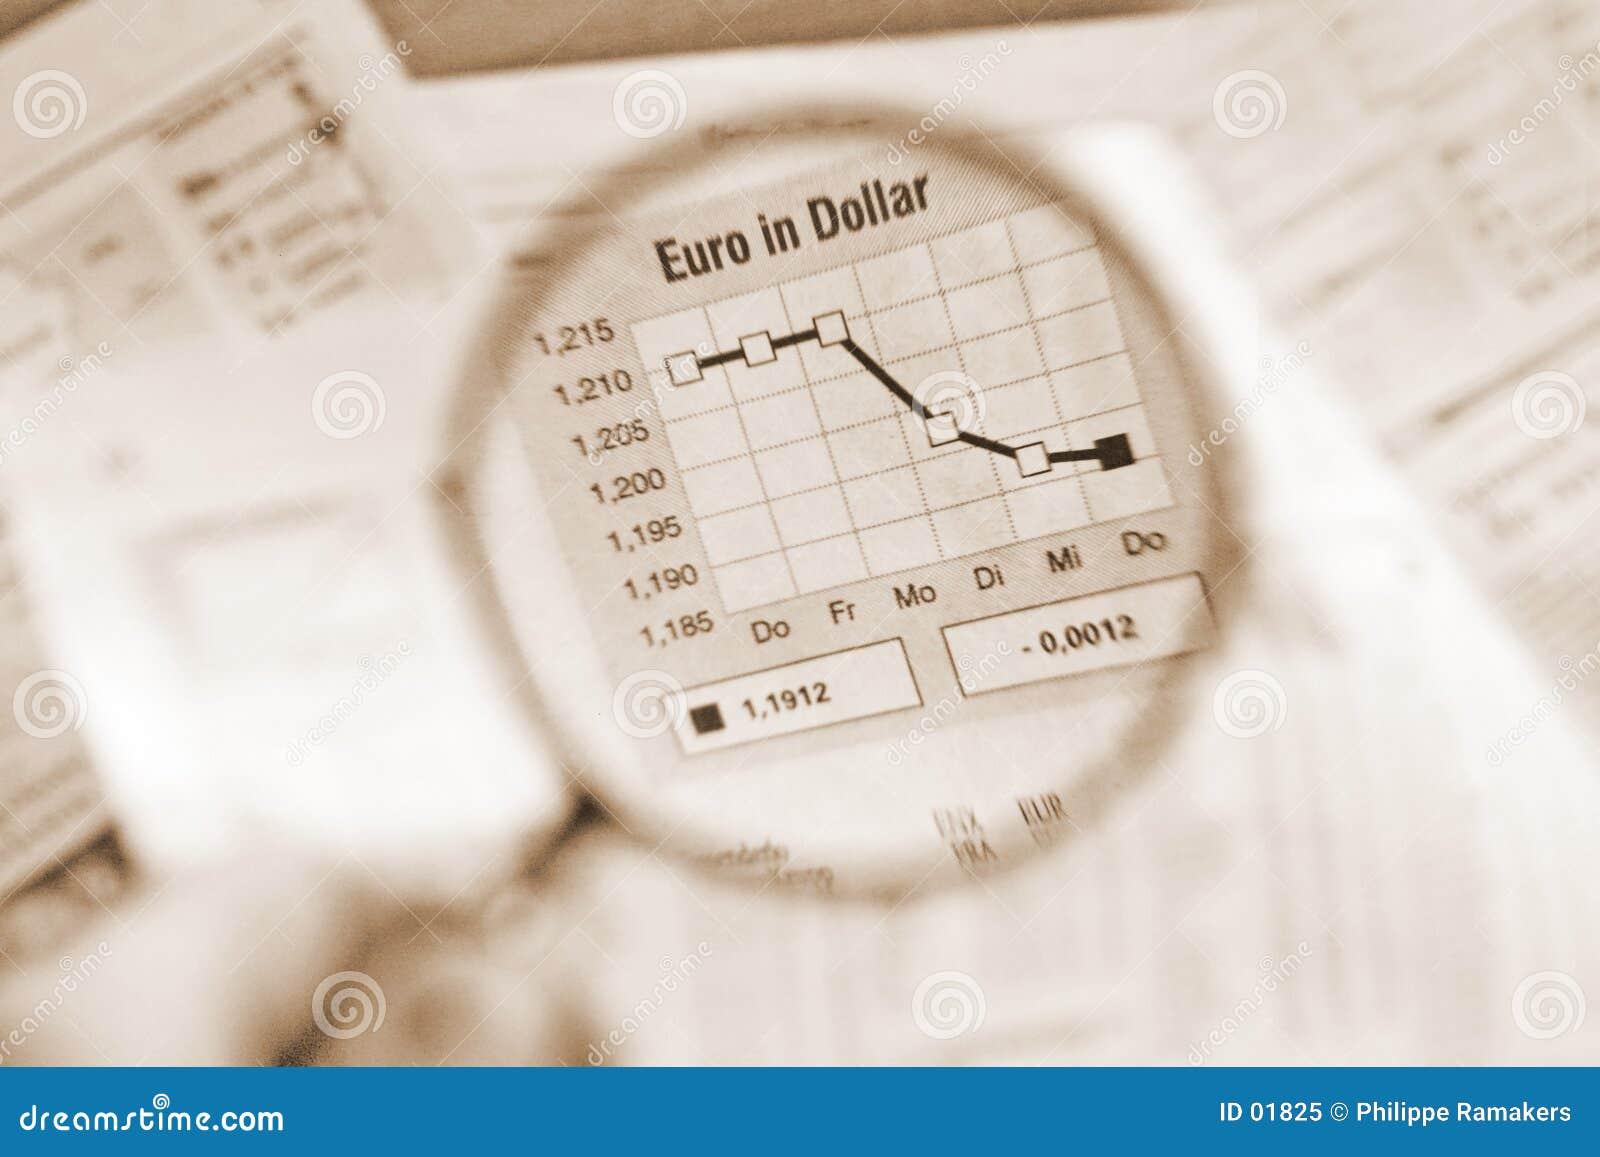 Euro en dólar